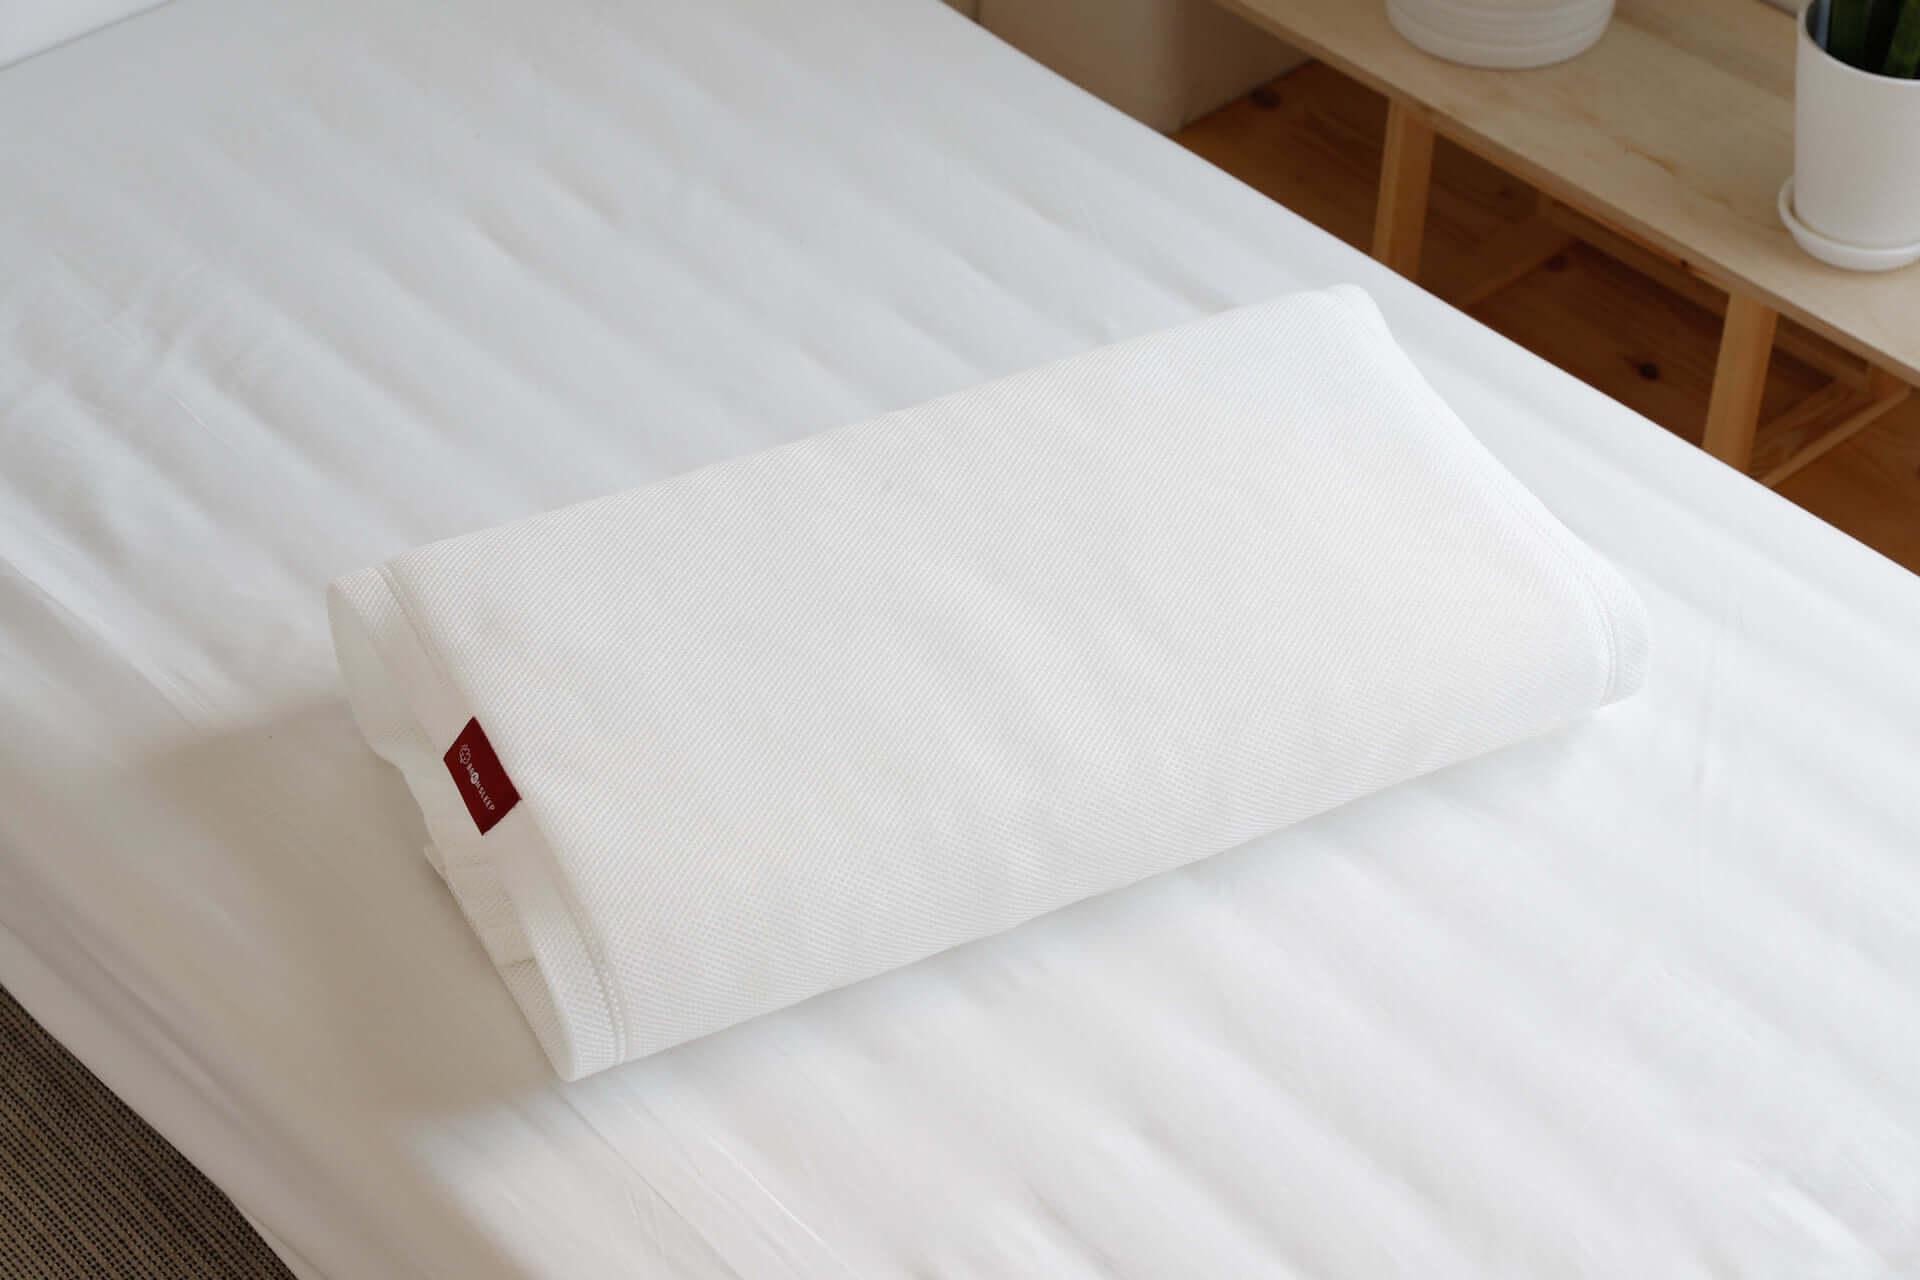 「HOTEL SHE, KYOTO」で極上のセルフケア宿泊体験ができる『hello, neu me』がスタート!「eume」プロデューサー・本島彩帆里のセレクトアイテムもプレゼント art201002_hotelshekyoto_1-1920x1280